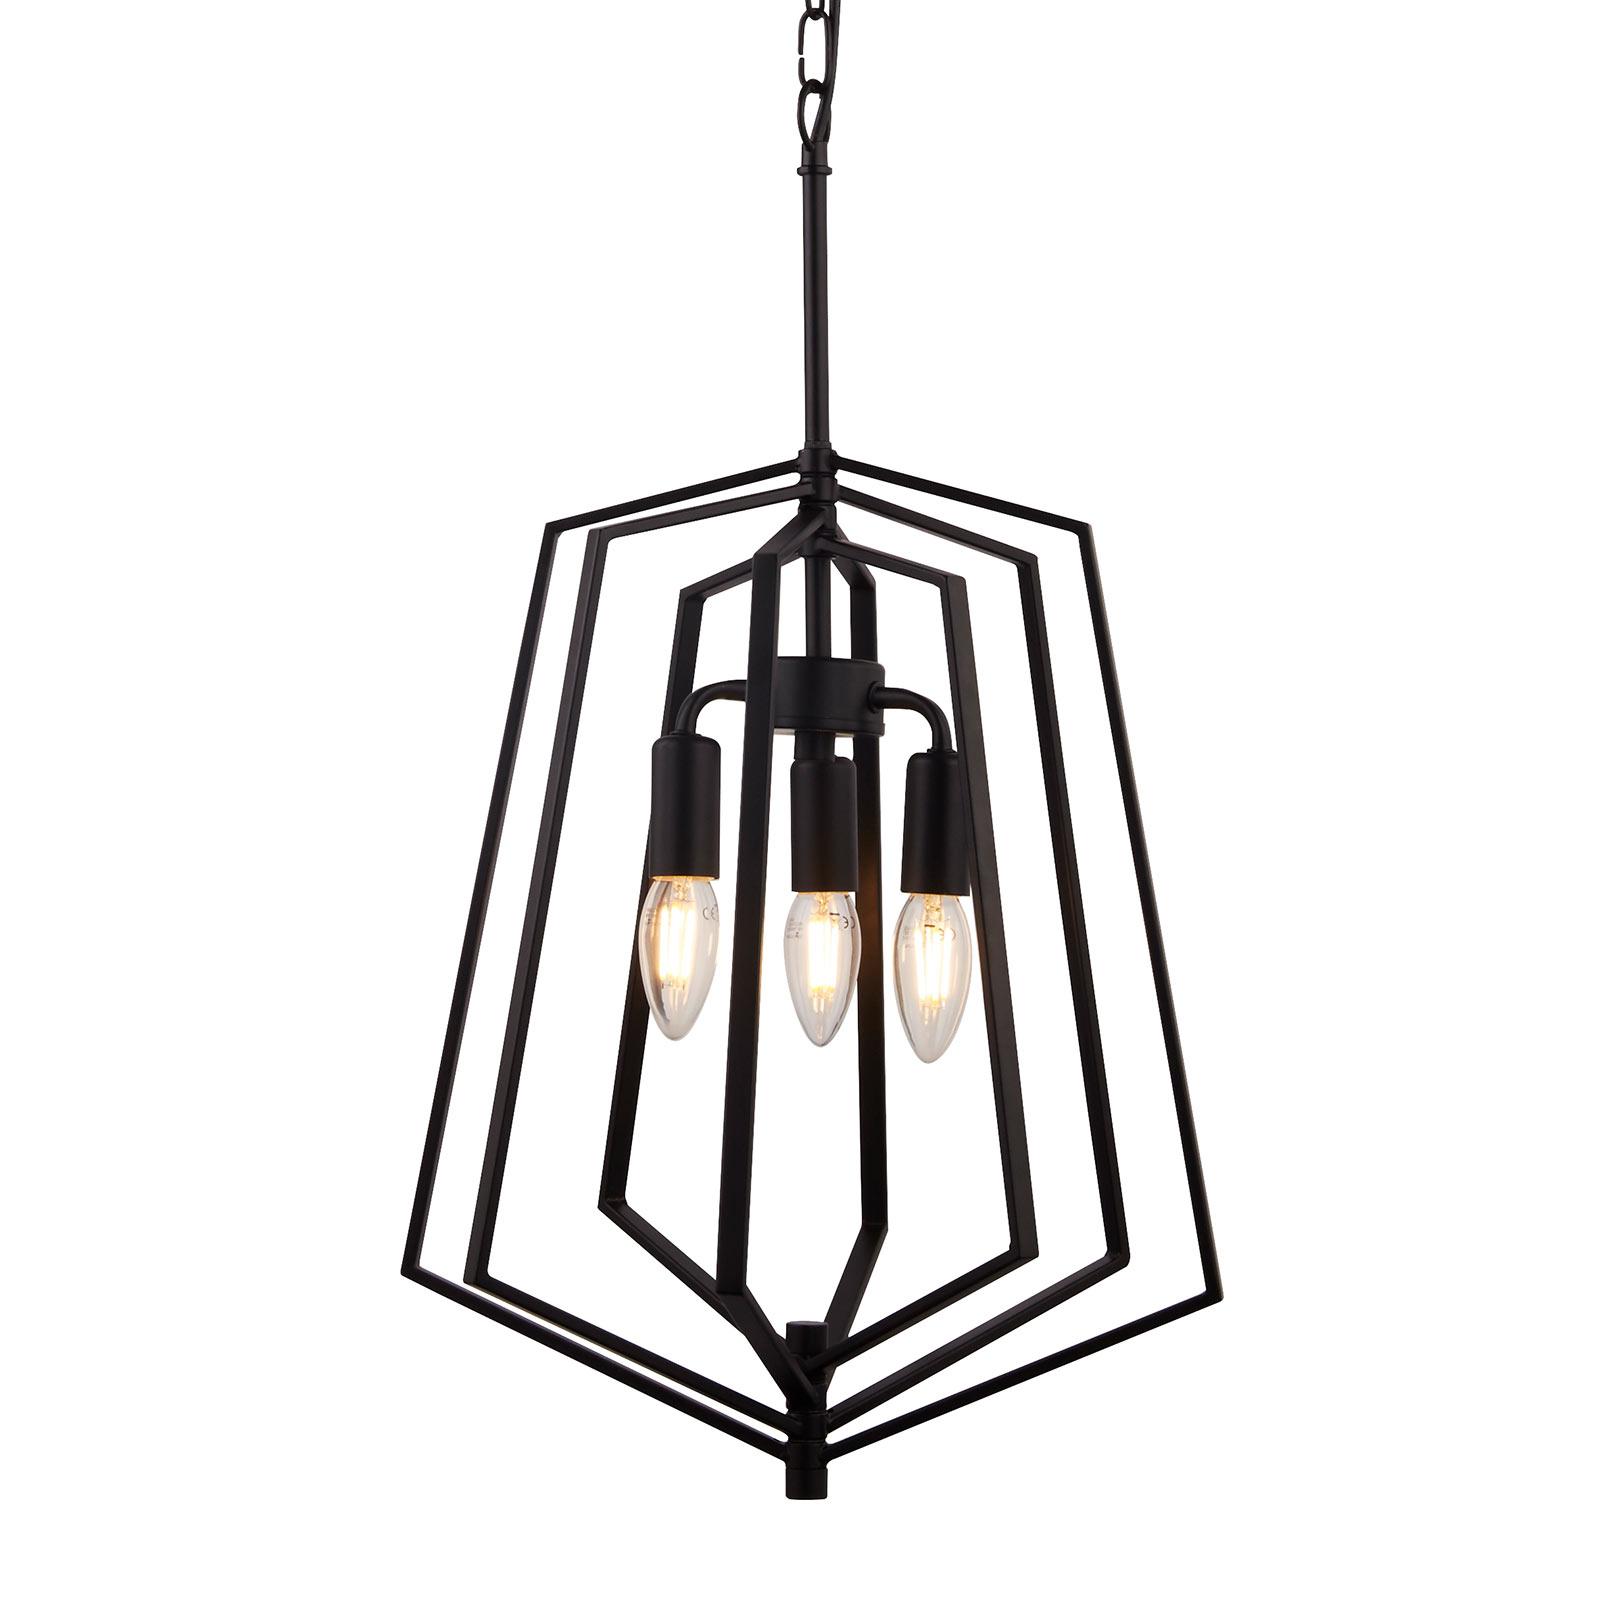 Hanglamp Slinky, 3-lamps, zwart, Ø 35 cm